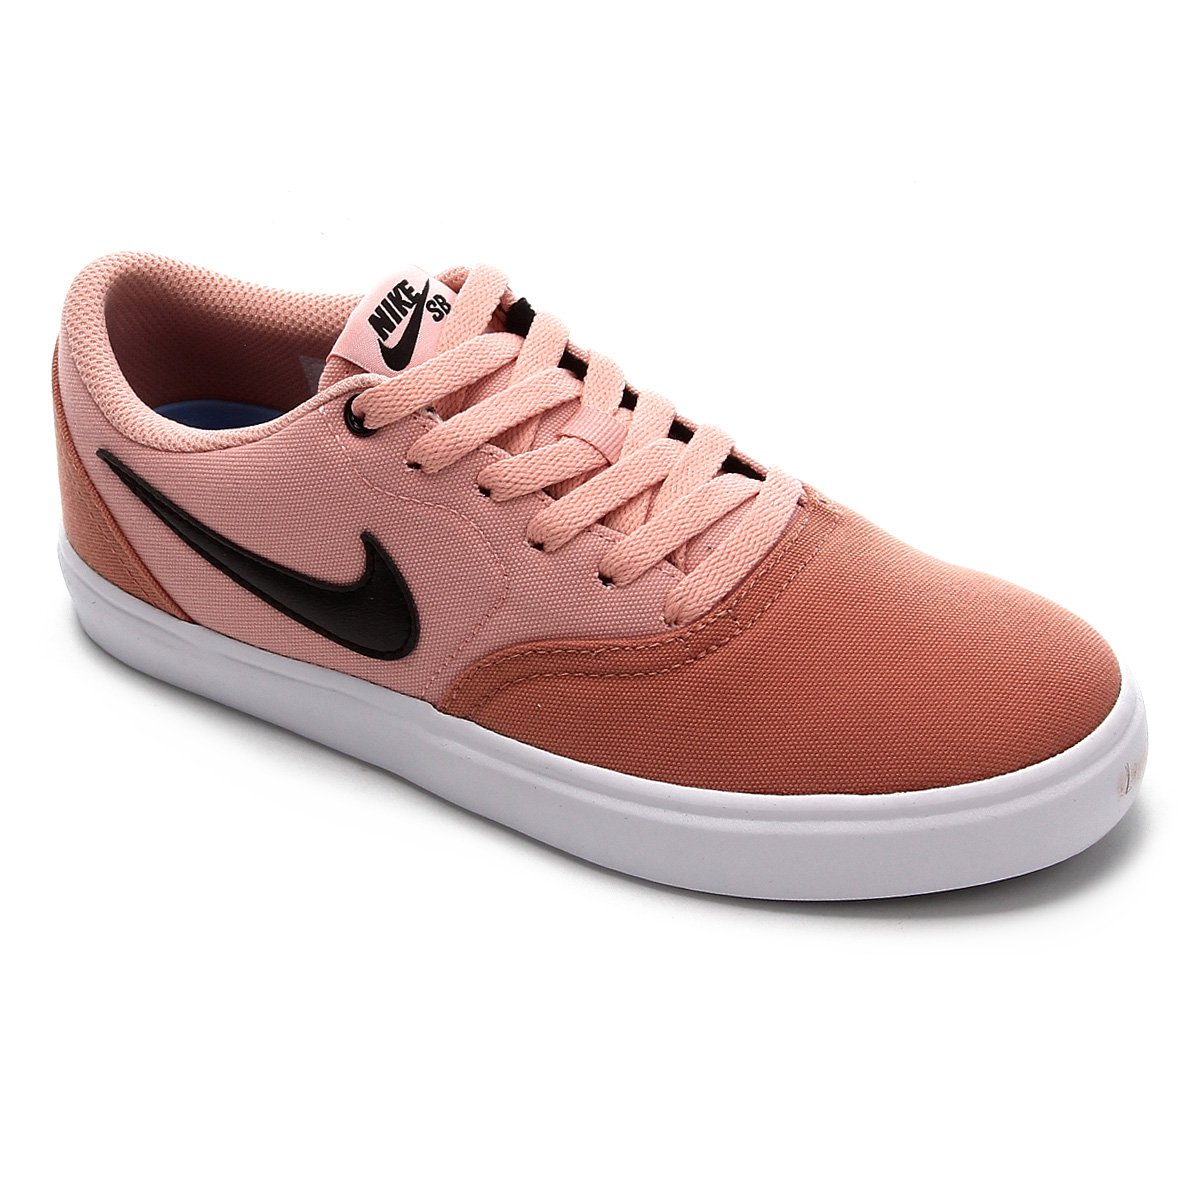 boa aparência loja oficial sapatos casuais nike feminino sb